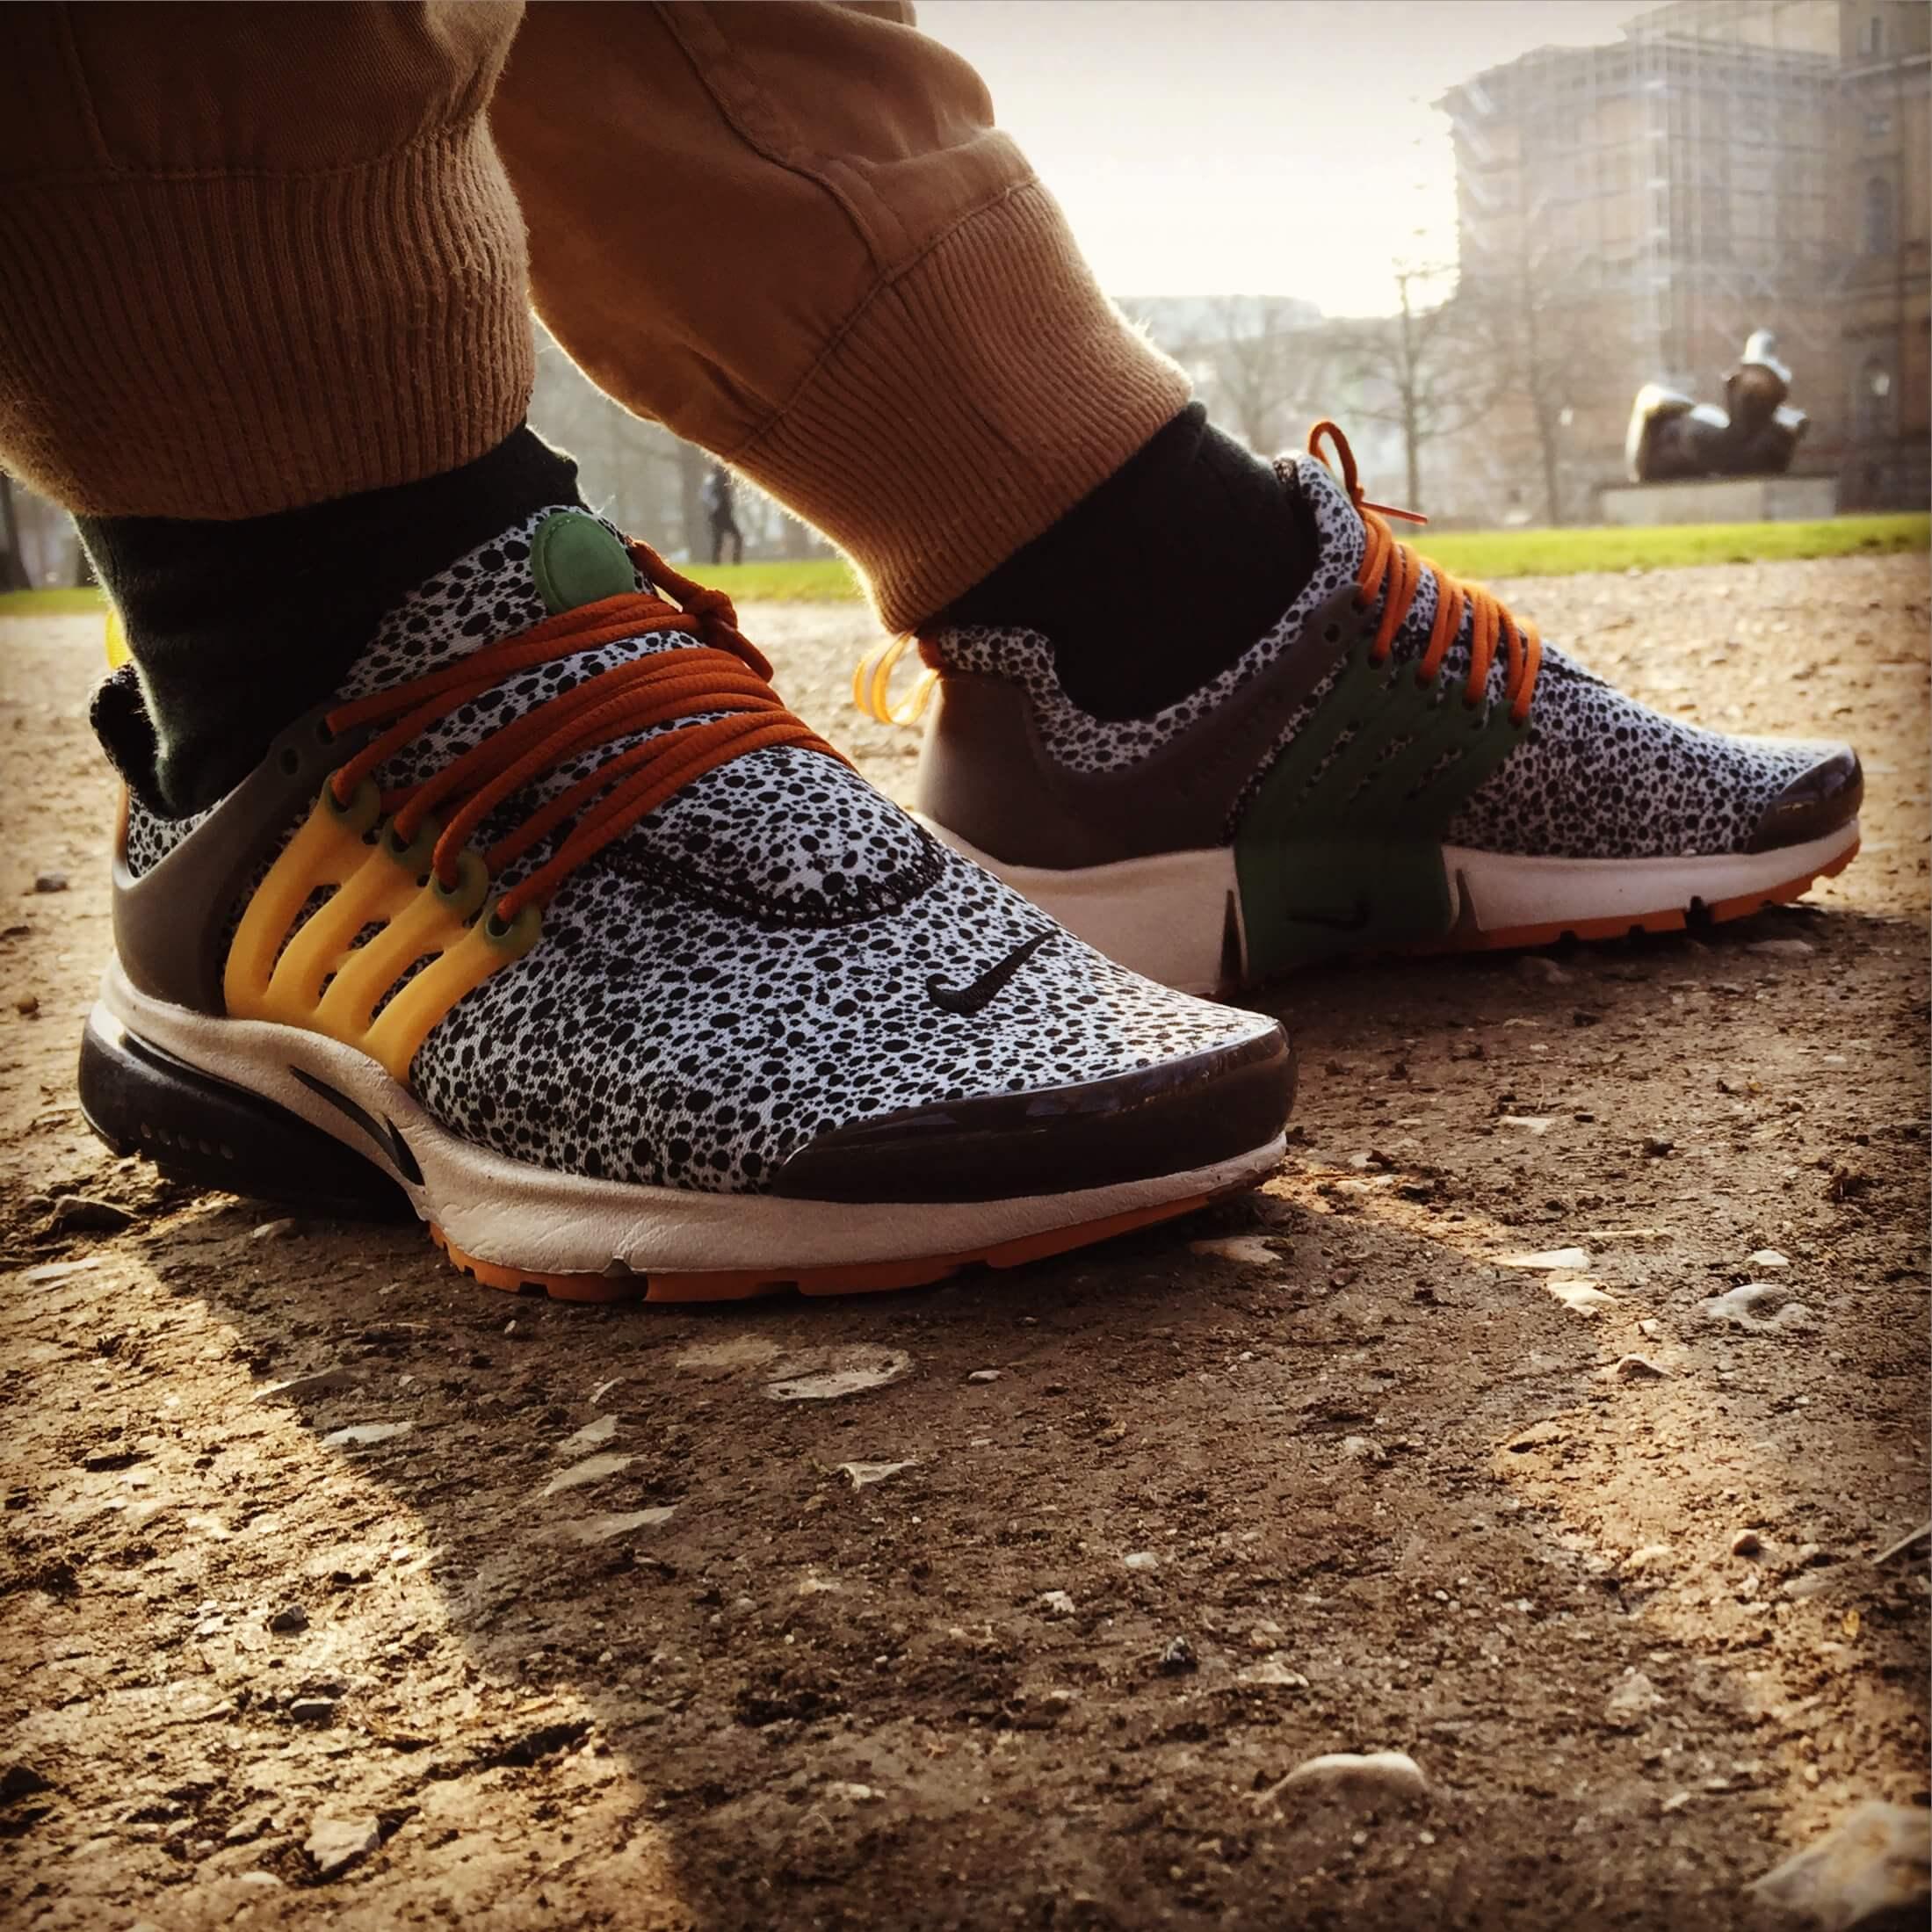 Nike-Presto-QS-Safari-Angle-View-Benstah-Onfeet